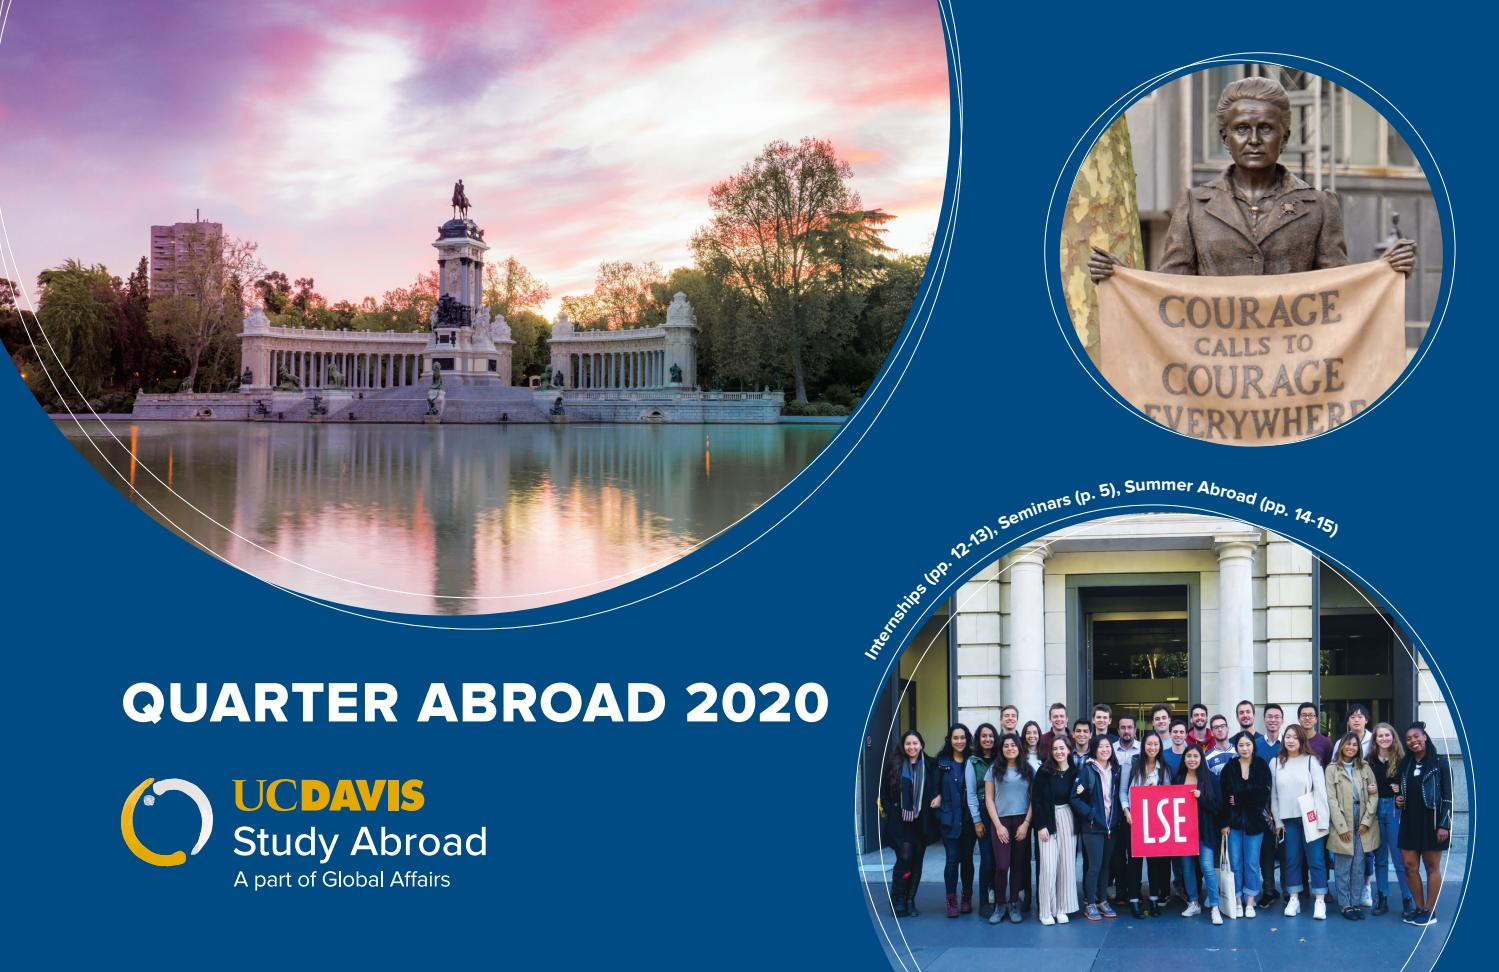 International Affairs Internships Summer 2020.Uc Davis Quarter Abroad 2020 Brochure By